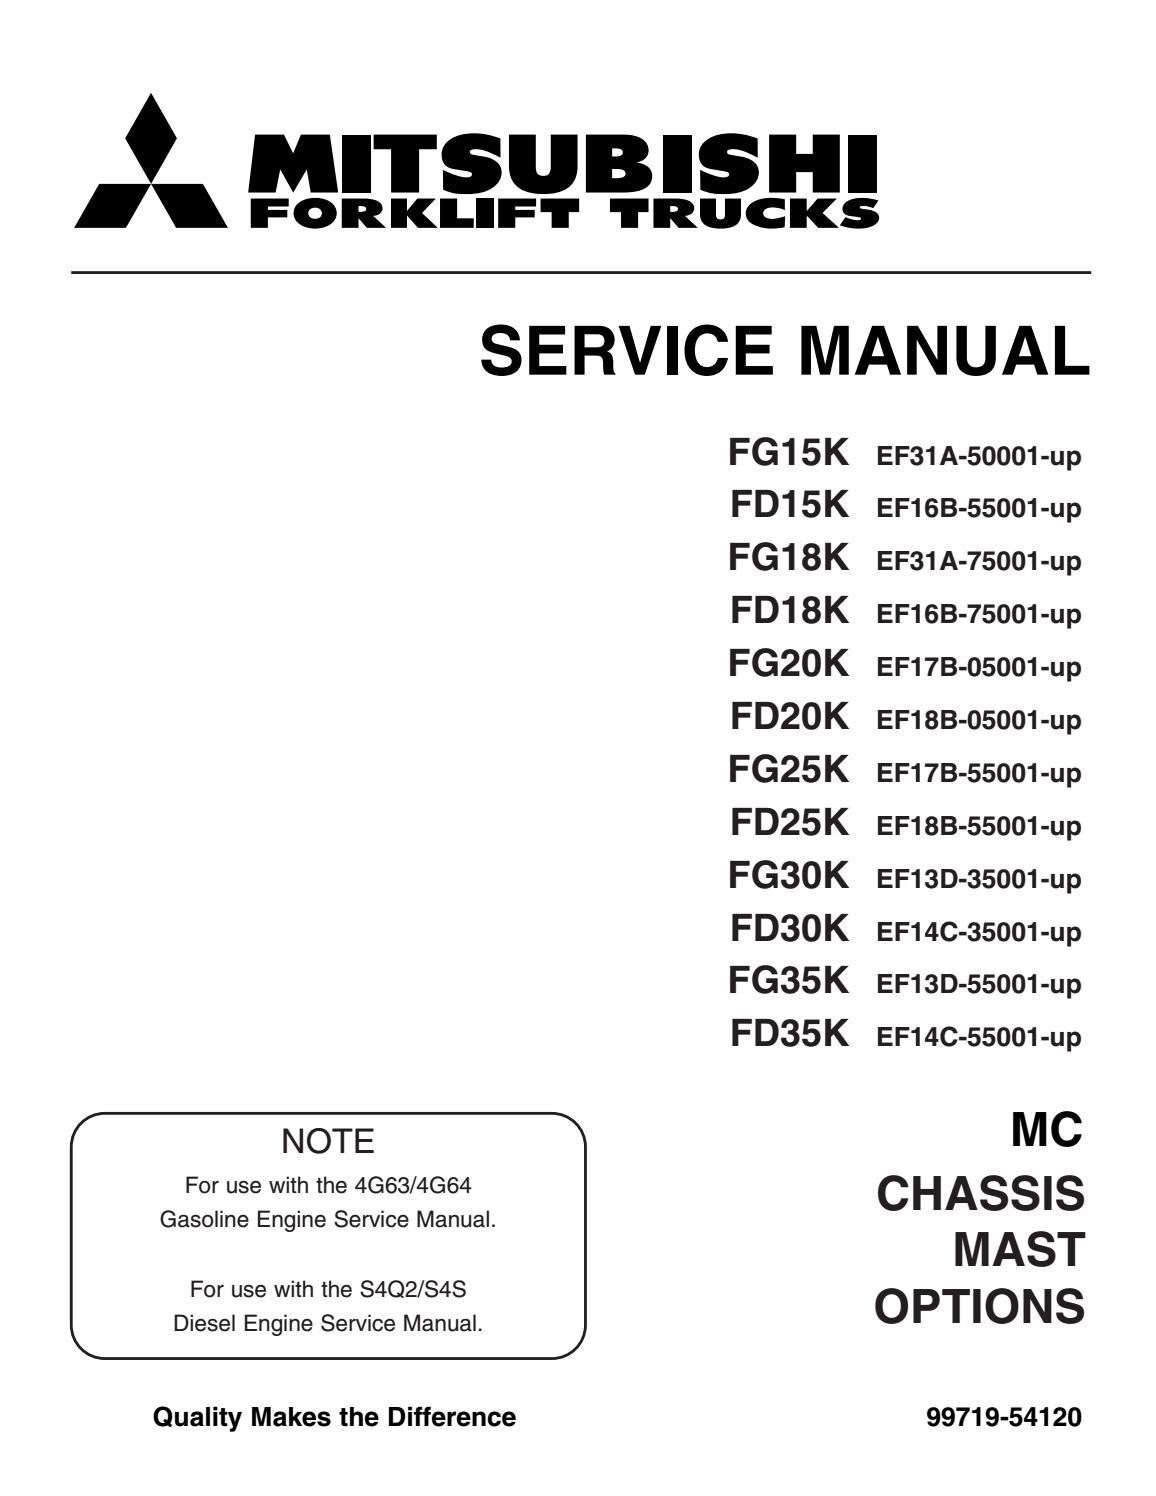 hight resolution of mitsubishi fg35k mc forklift trucks service repair manual sn ef14c 55001 up by 16326108 issuu